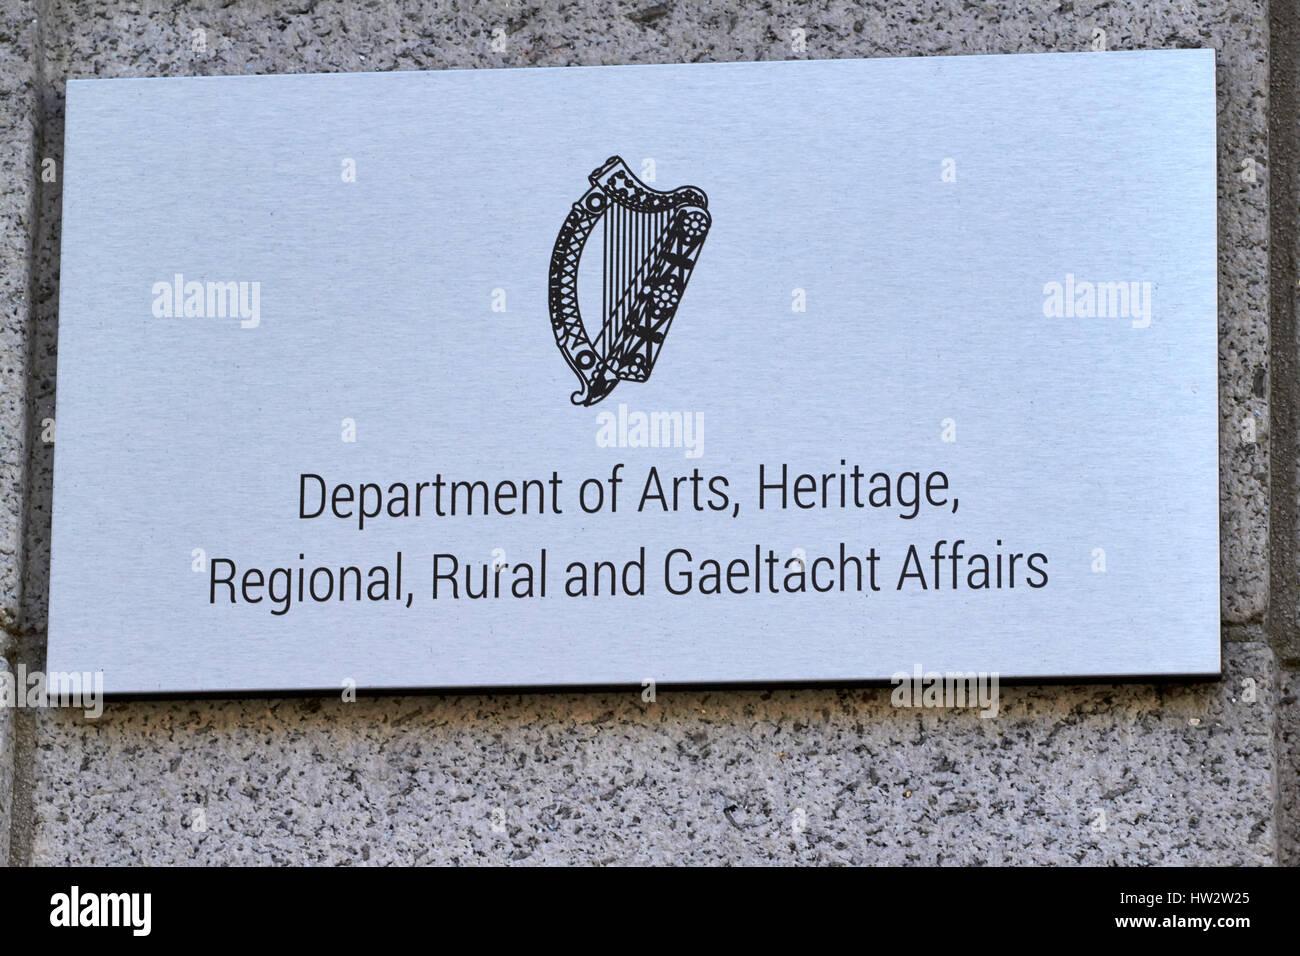 department of arts heritage regional rural and gaeltacht affairs Dublin Republic of Ireland - Stock Image